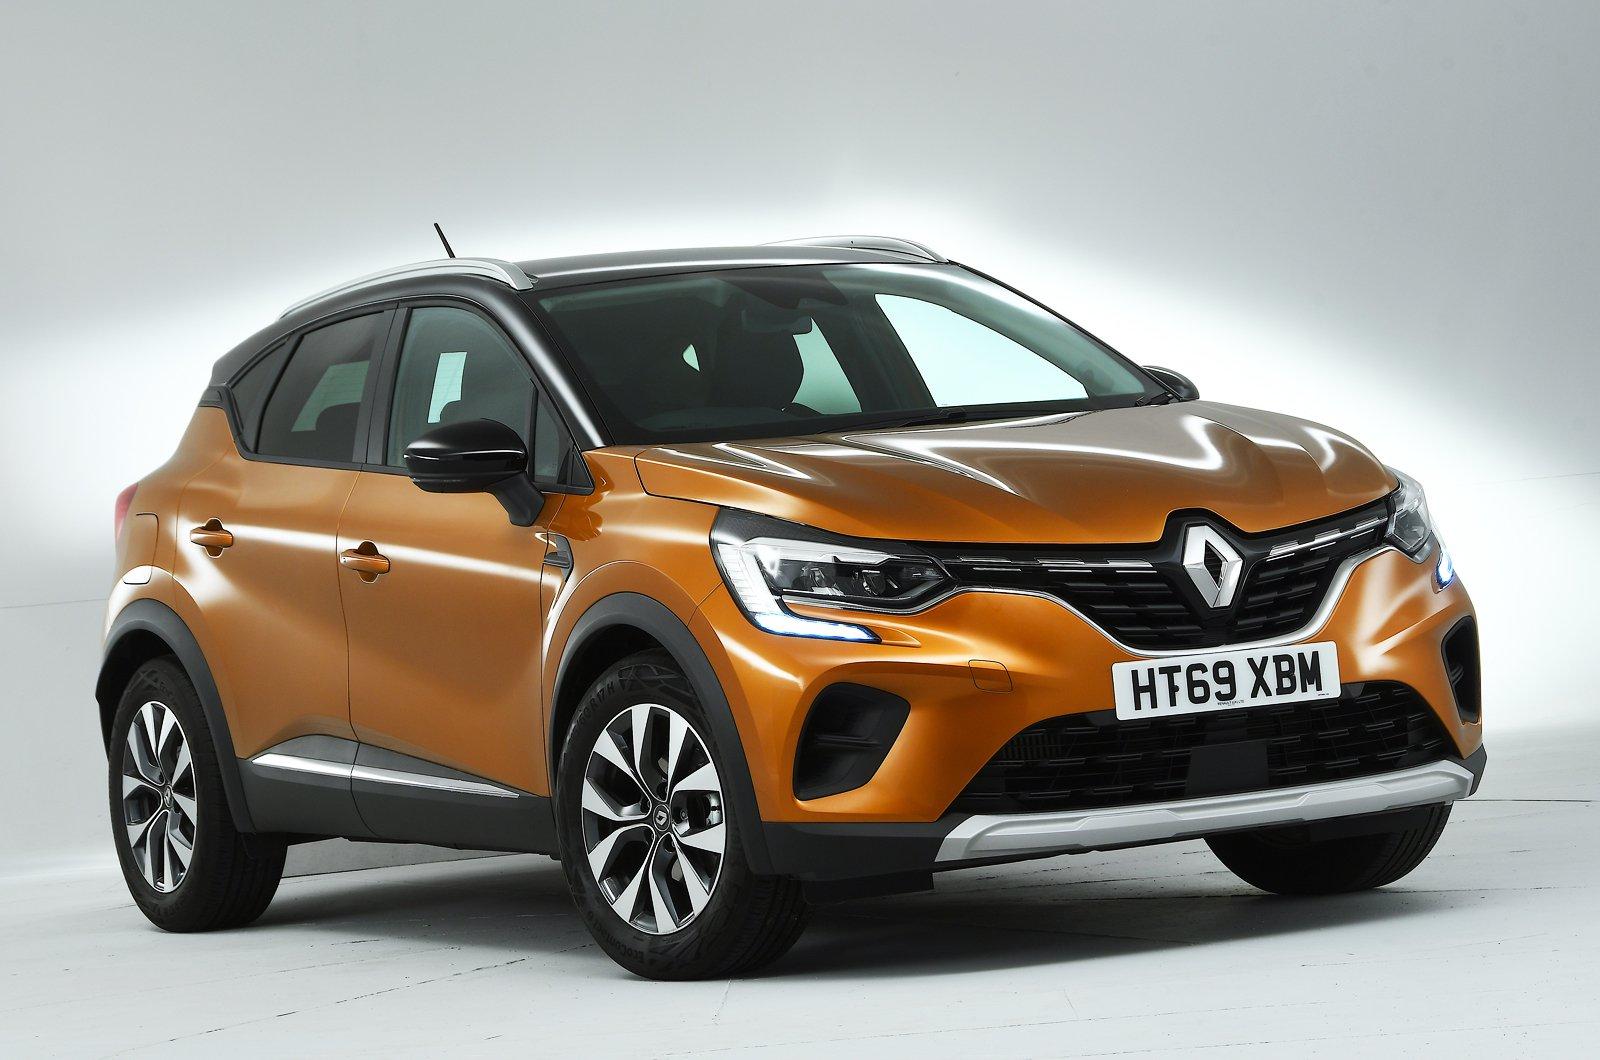 Renault Captur front studio - orange 69-plate car